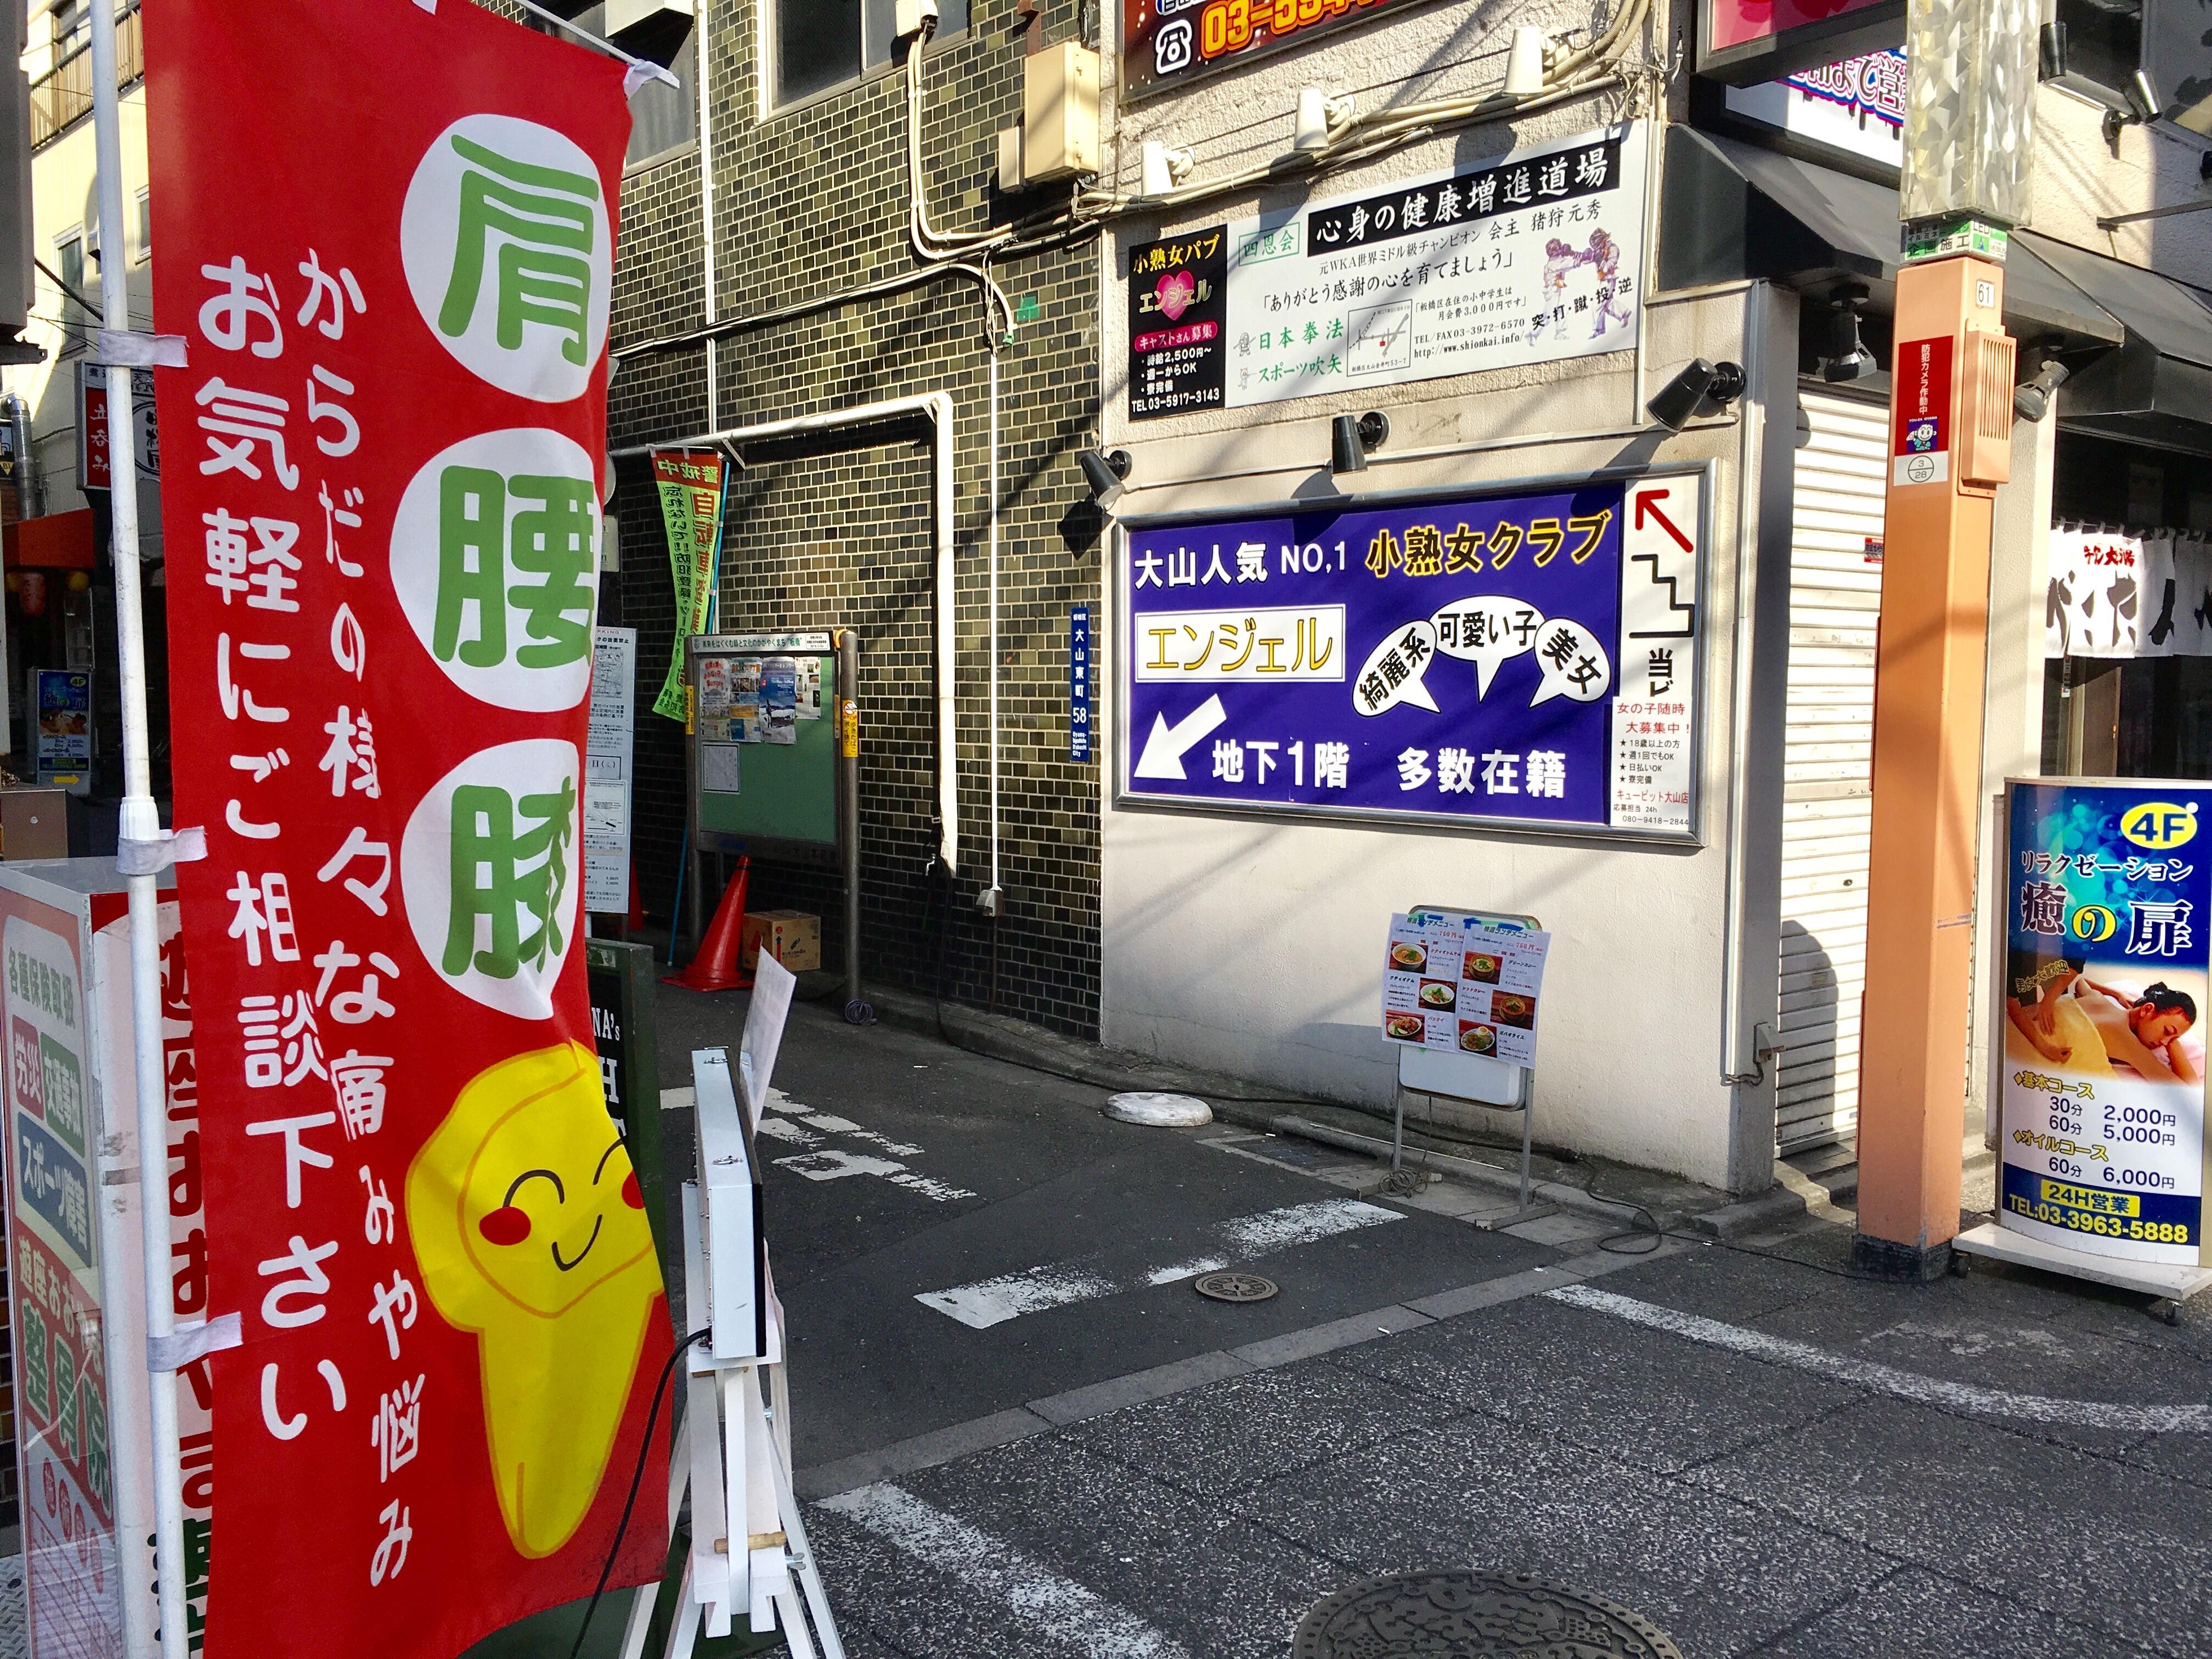 f:id:SoichiroIkeshita:20170219215045j:image